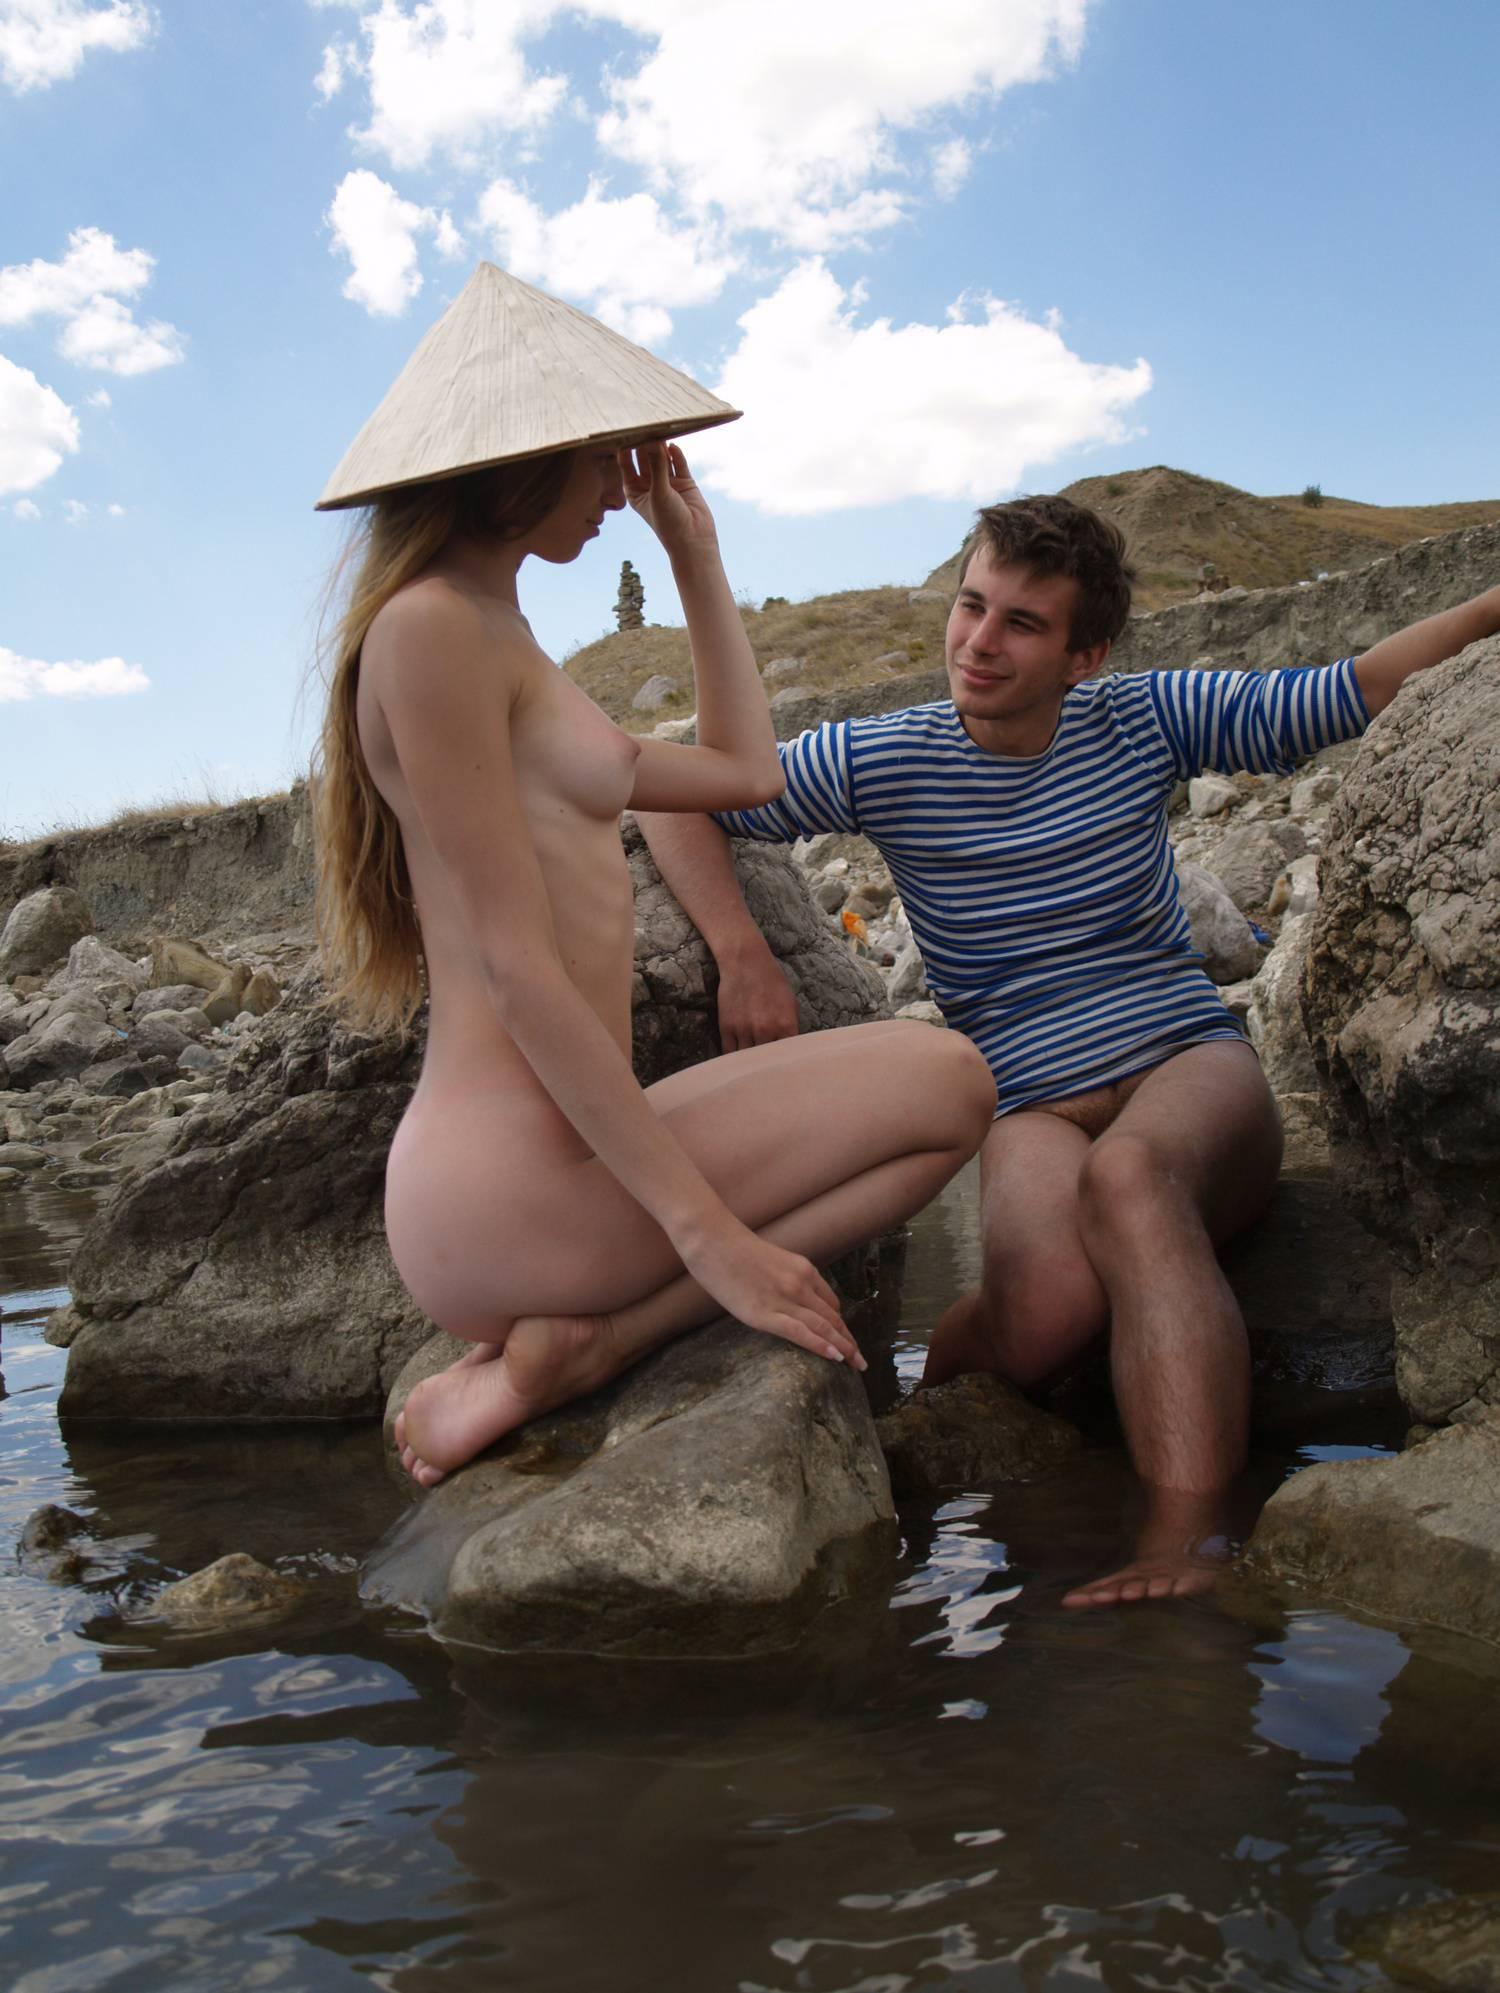 Pure Nudism Photos Couple of a Naturist Angel - 1